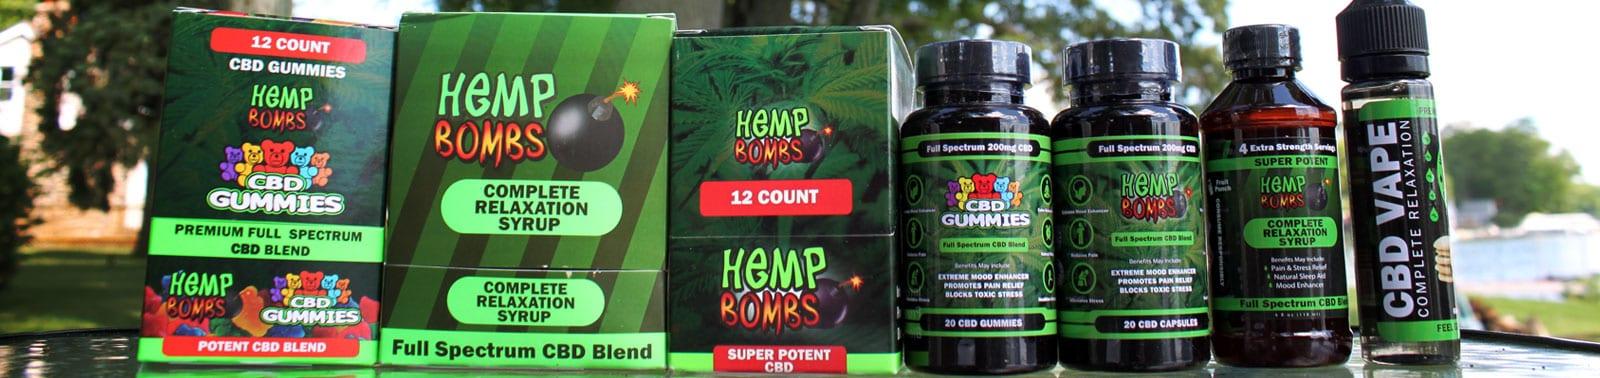 Hemp Bombs - Premium CBD products derived from industrial hemp